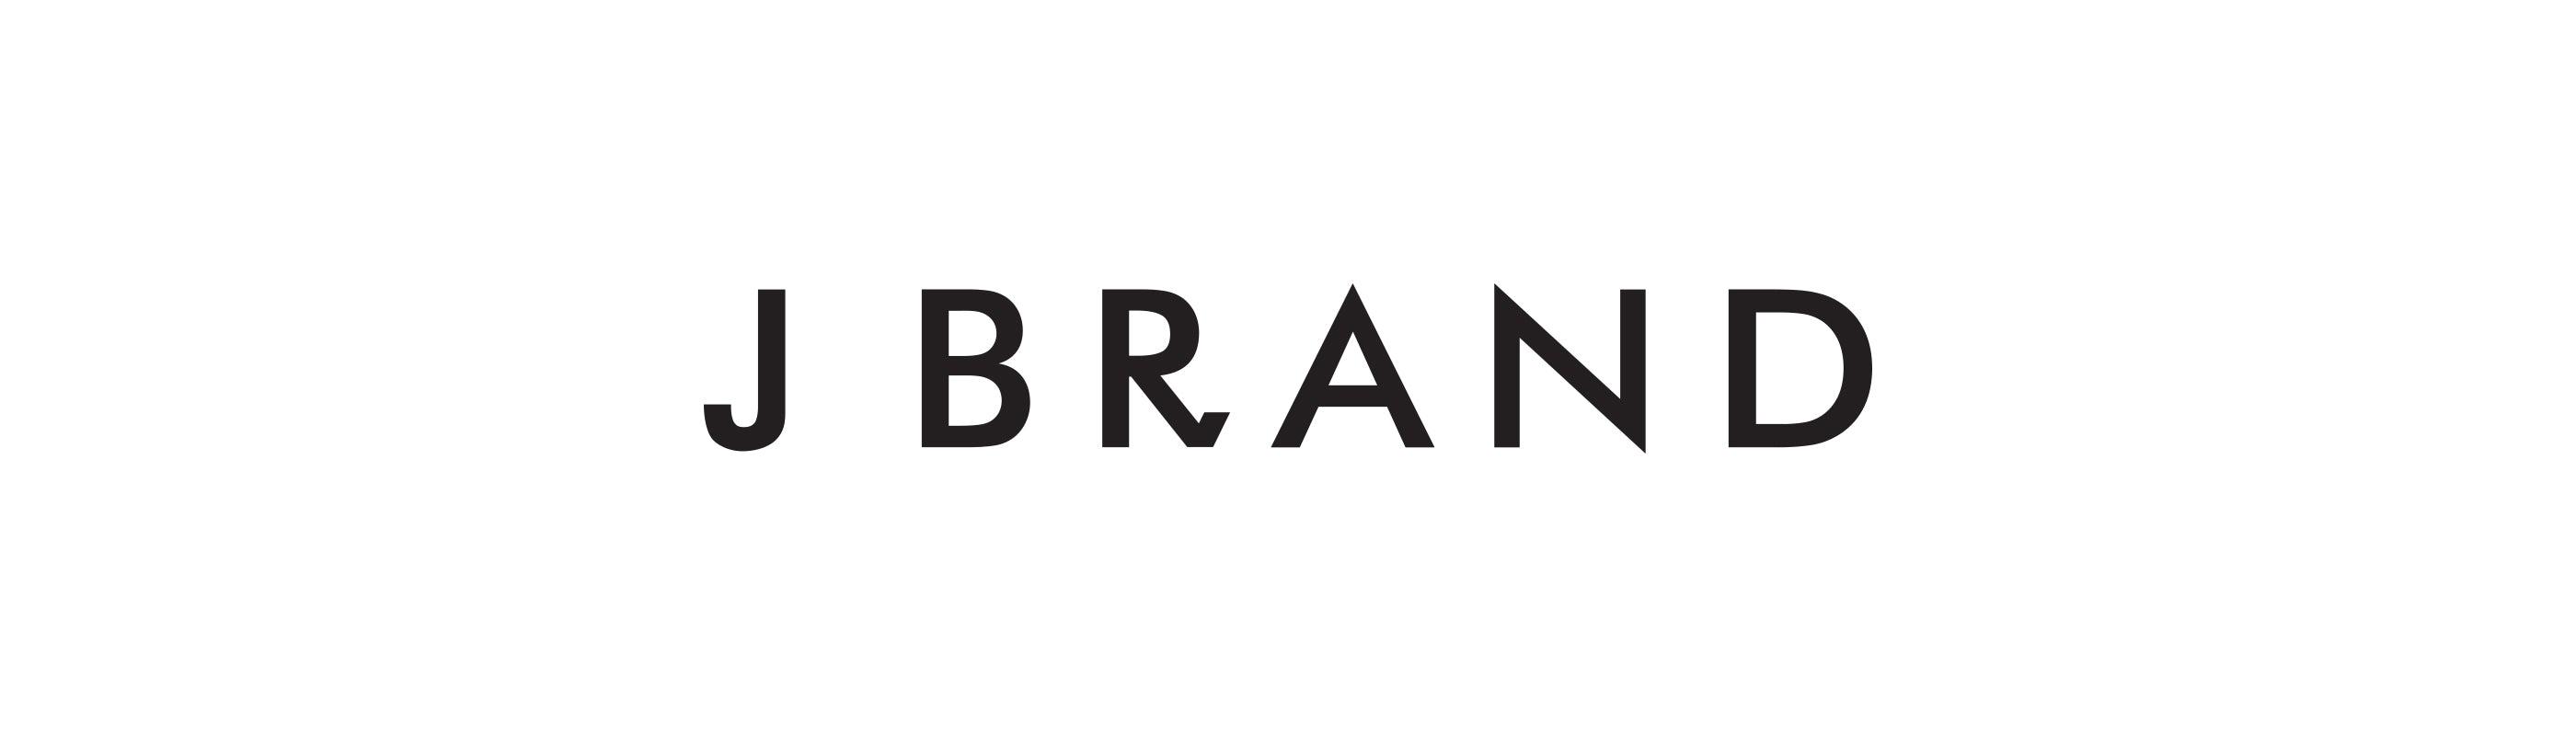 Profile image for J Brand